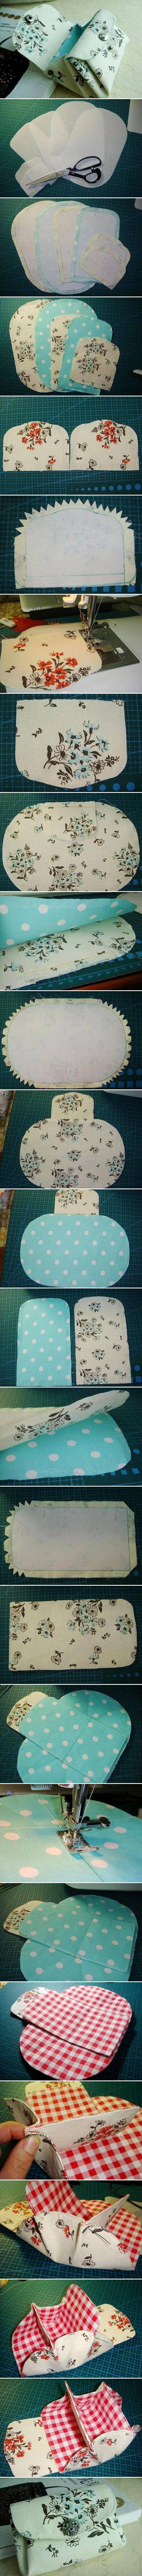 DIY Fabric Folding Purse